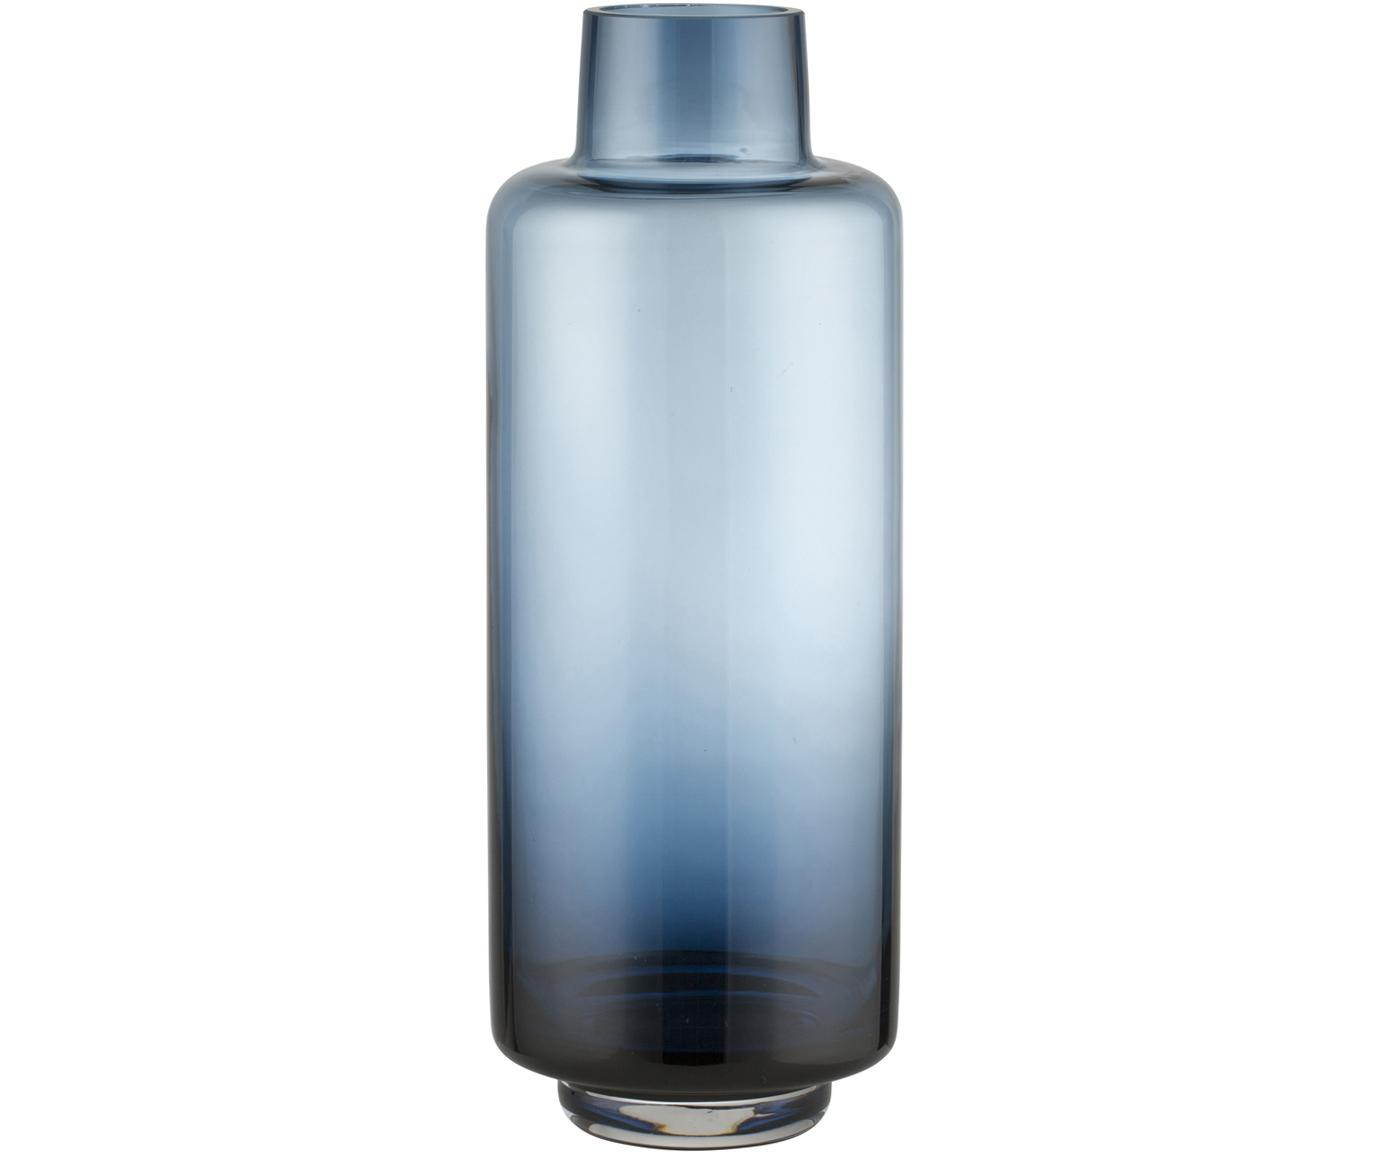 Vaso in vetro soffiato Hedria, Vetro, Blu, Ø 11 x Alt. 30 cm